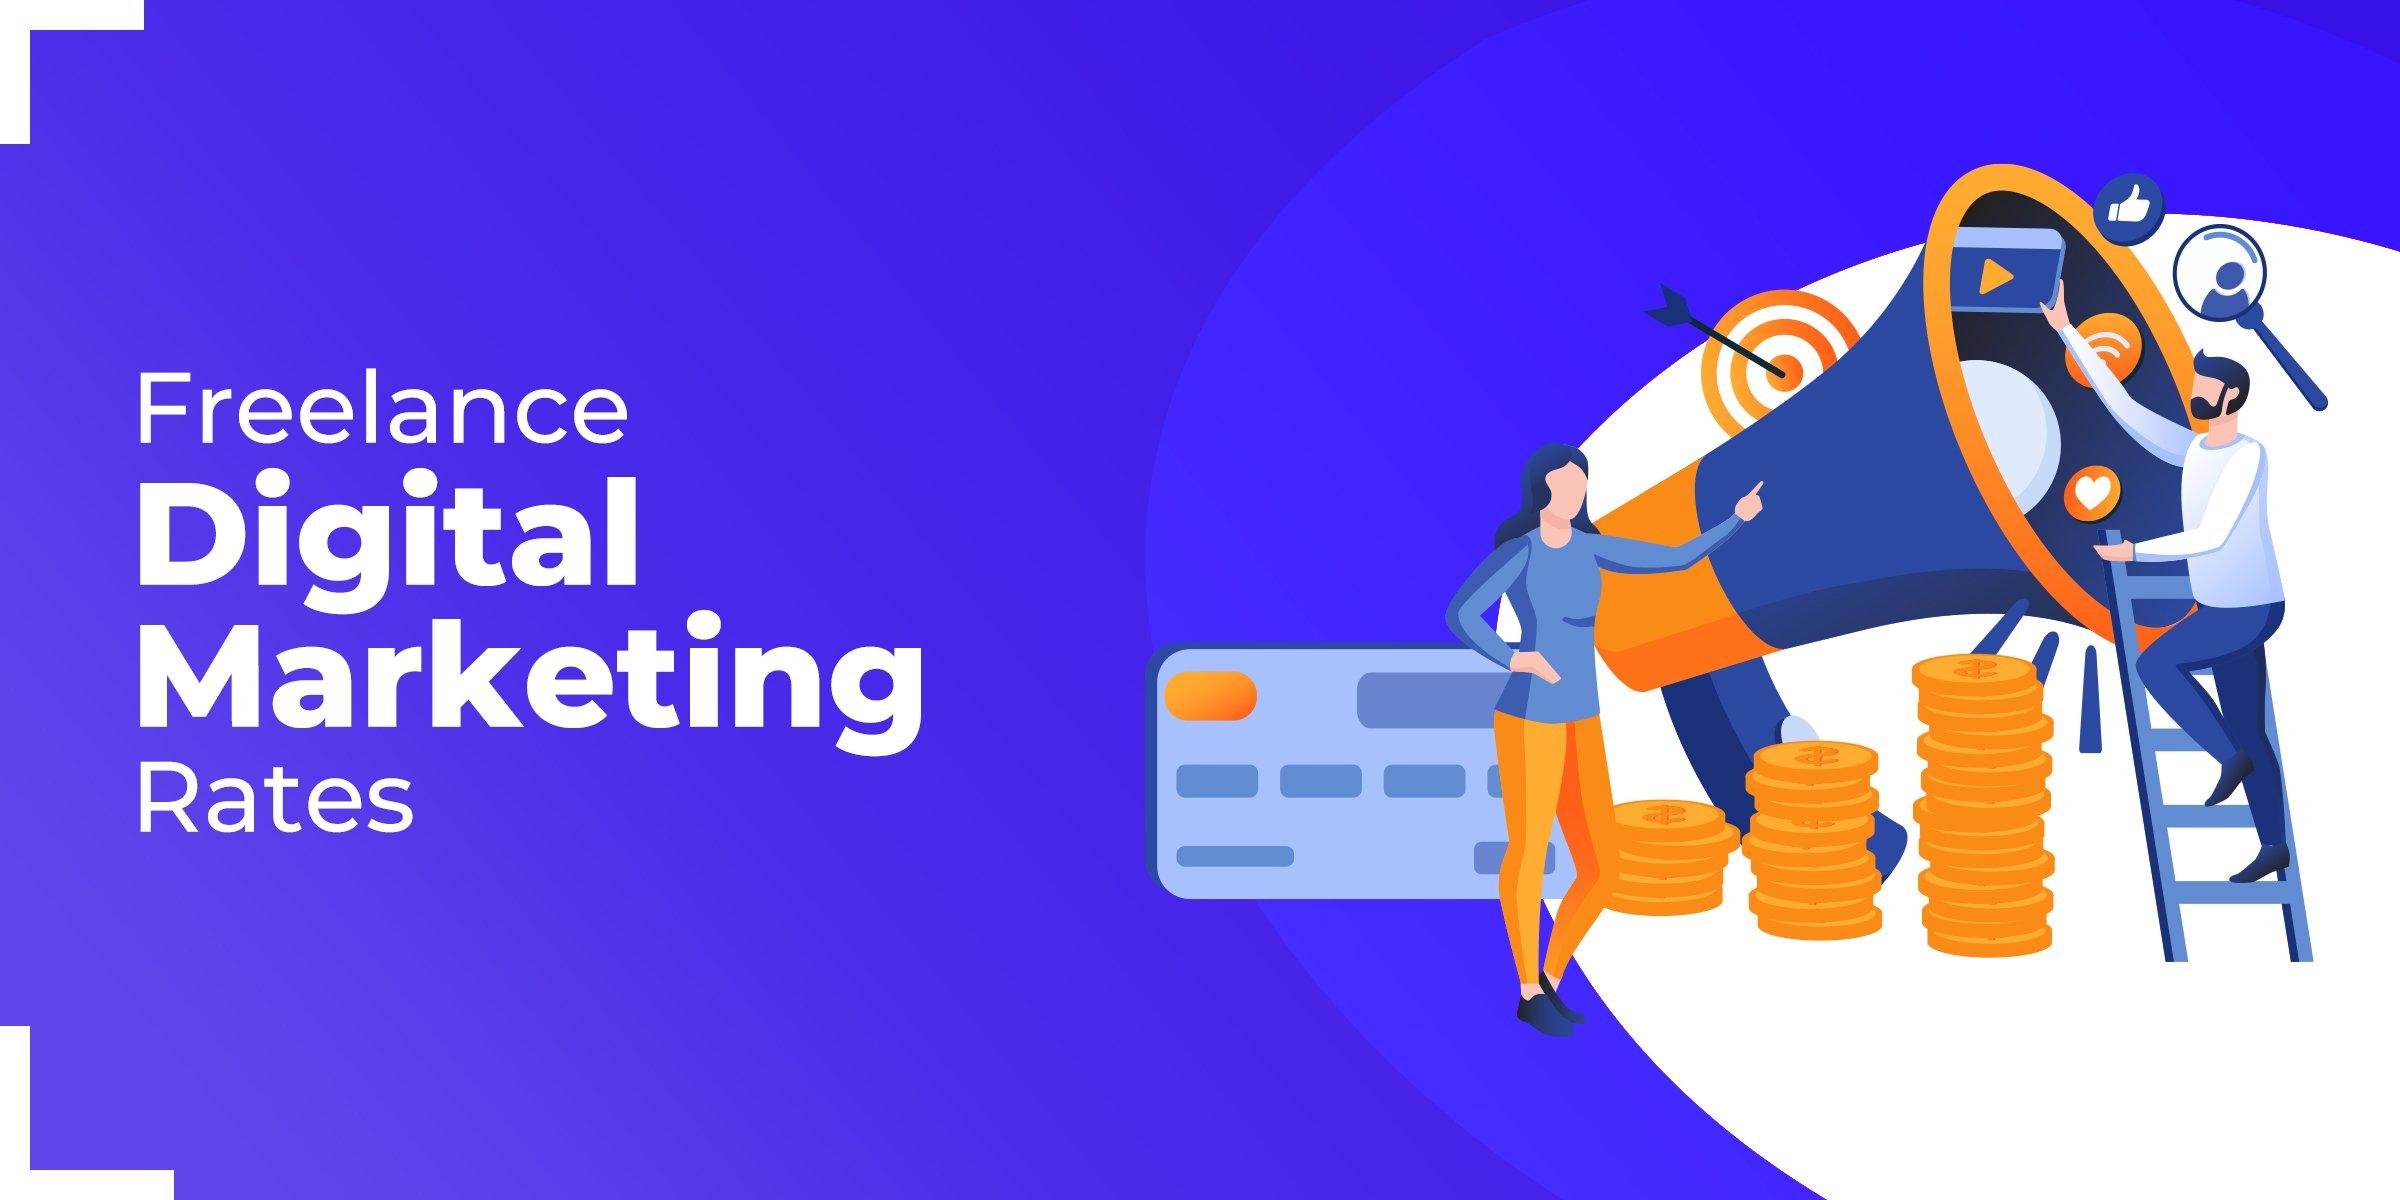 Freelance Digital Marketing Rates